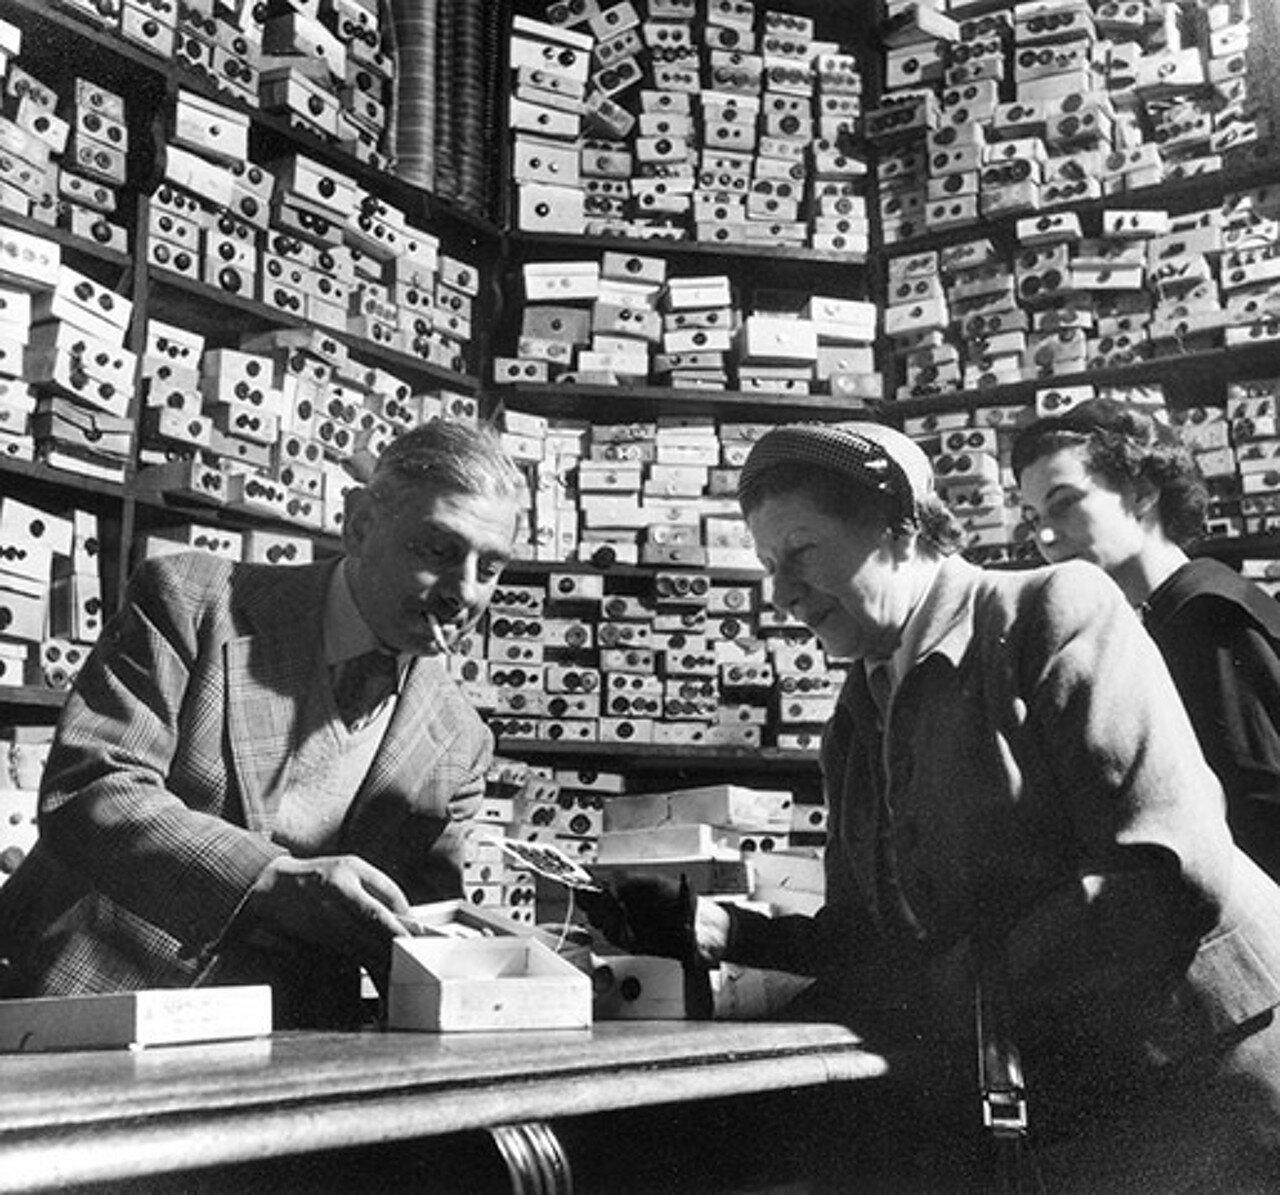 1953. Лавка пуговиц на Пикадилли. Лондон